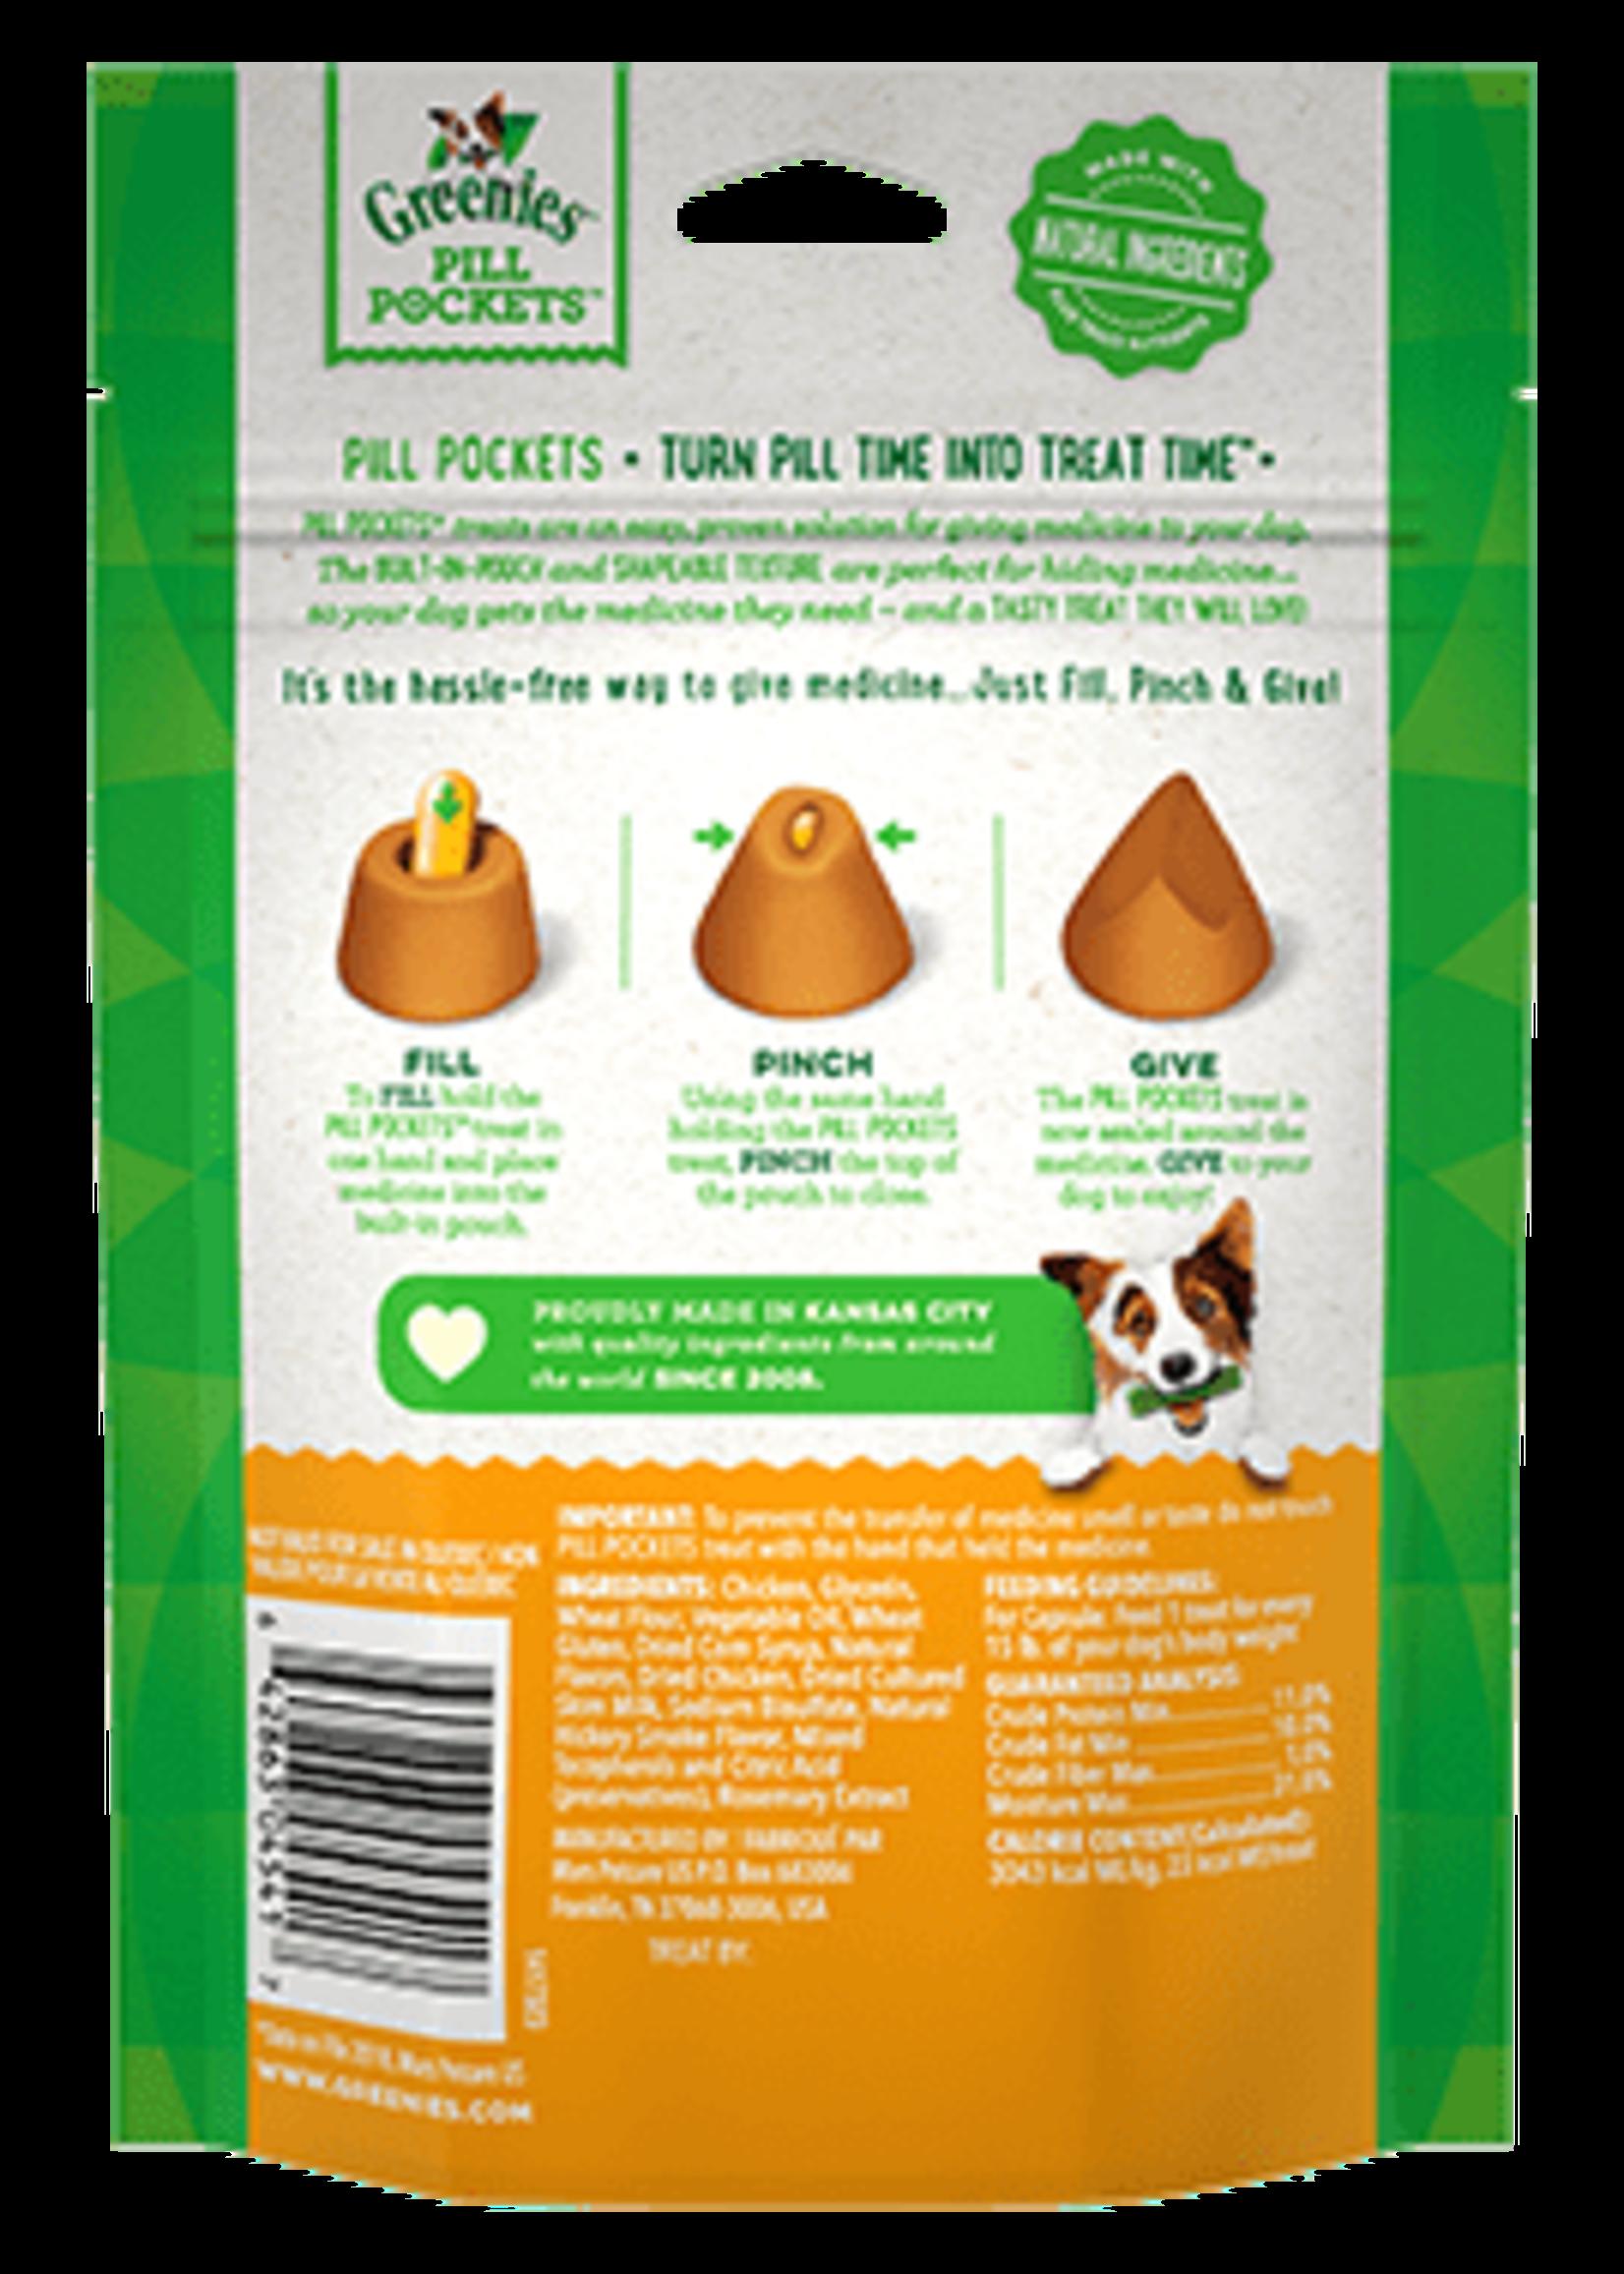 Greenies Greenies Pill Pockets Capsule Size, Chicken Flavor 7.9oz